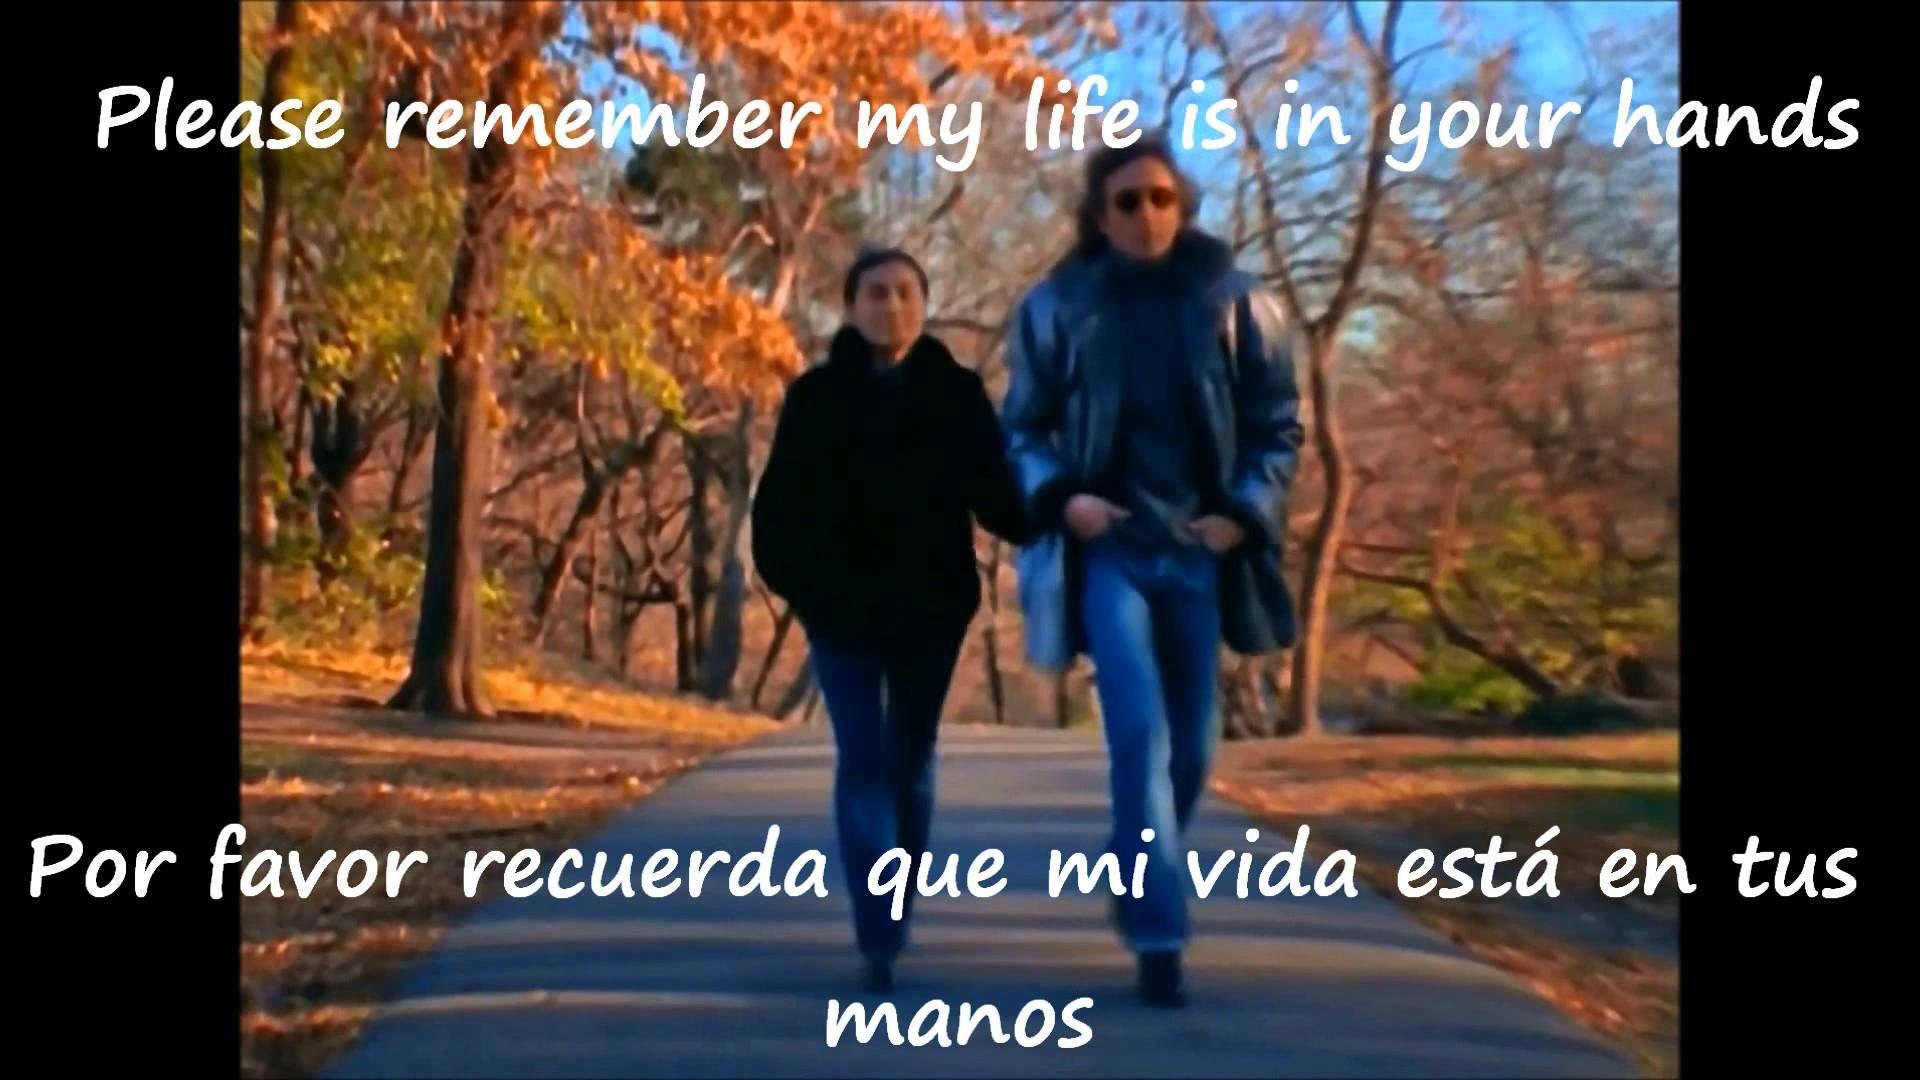 John Lennon Woman Subtitulada Inglés Español Hd John Lennon Lennon Songs To Sing